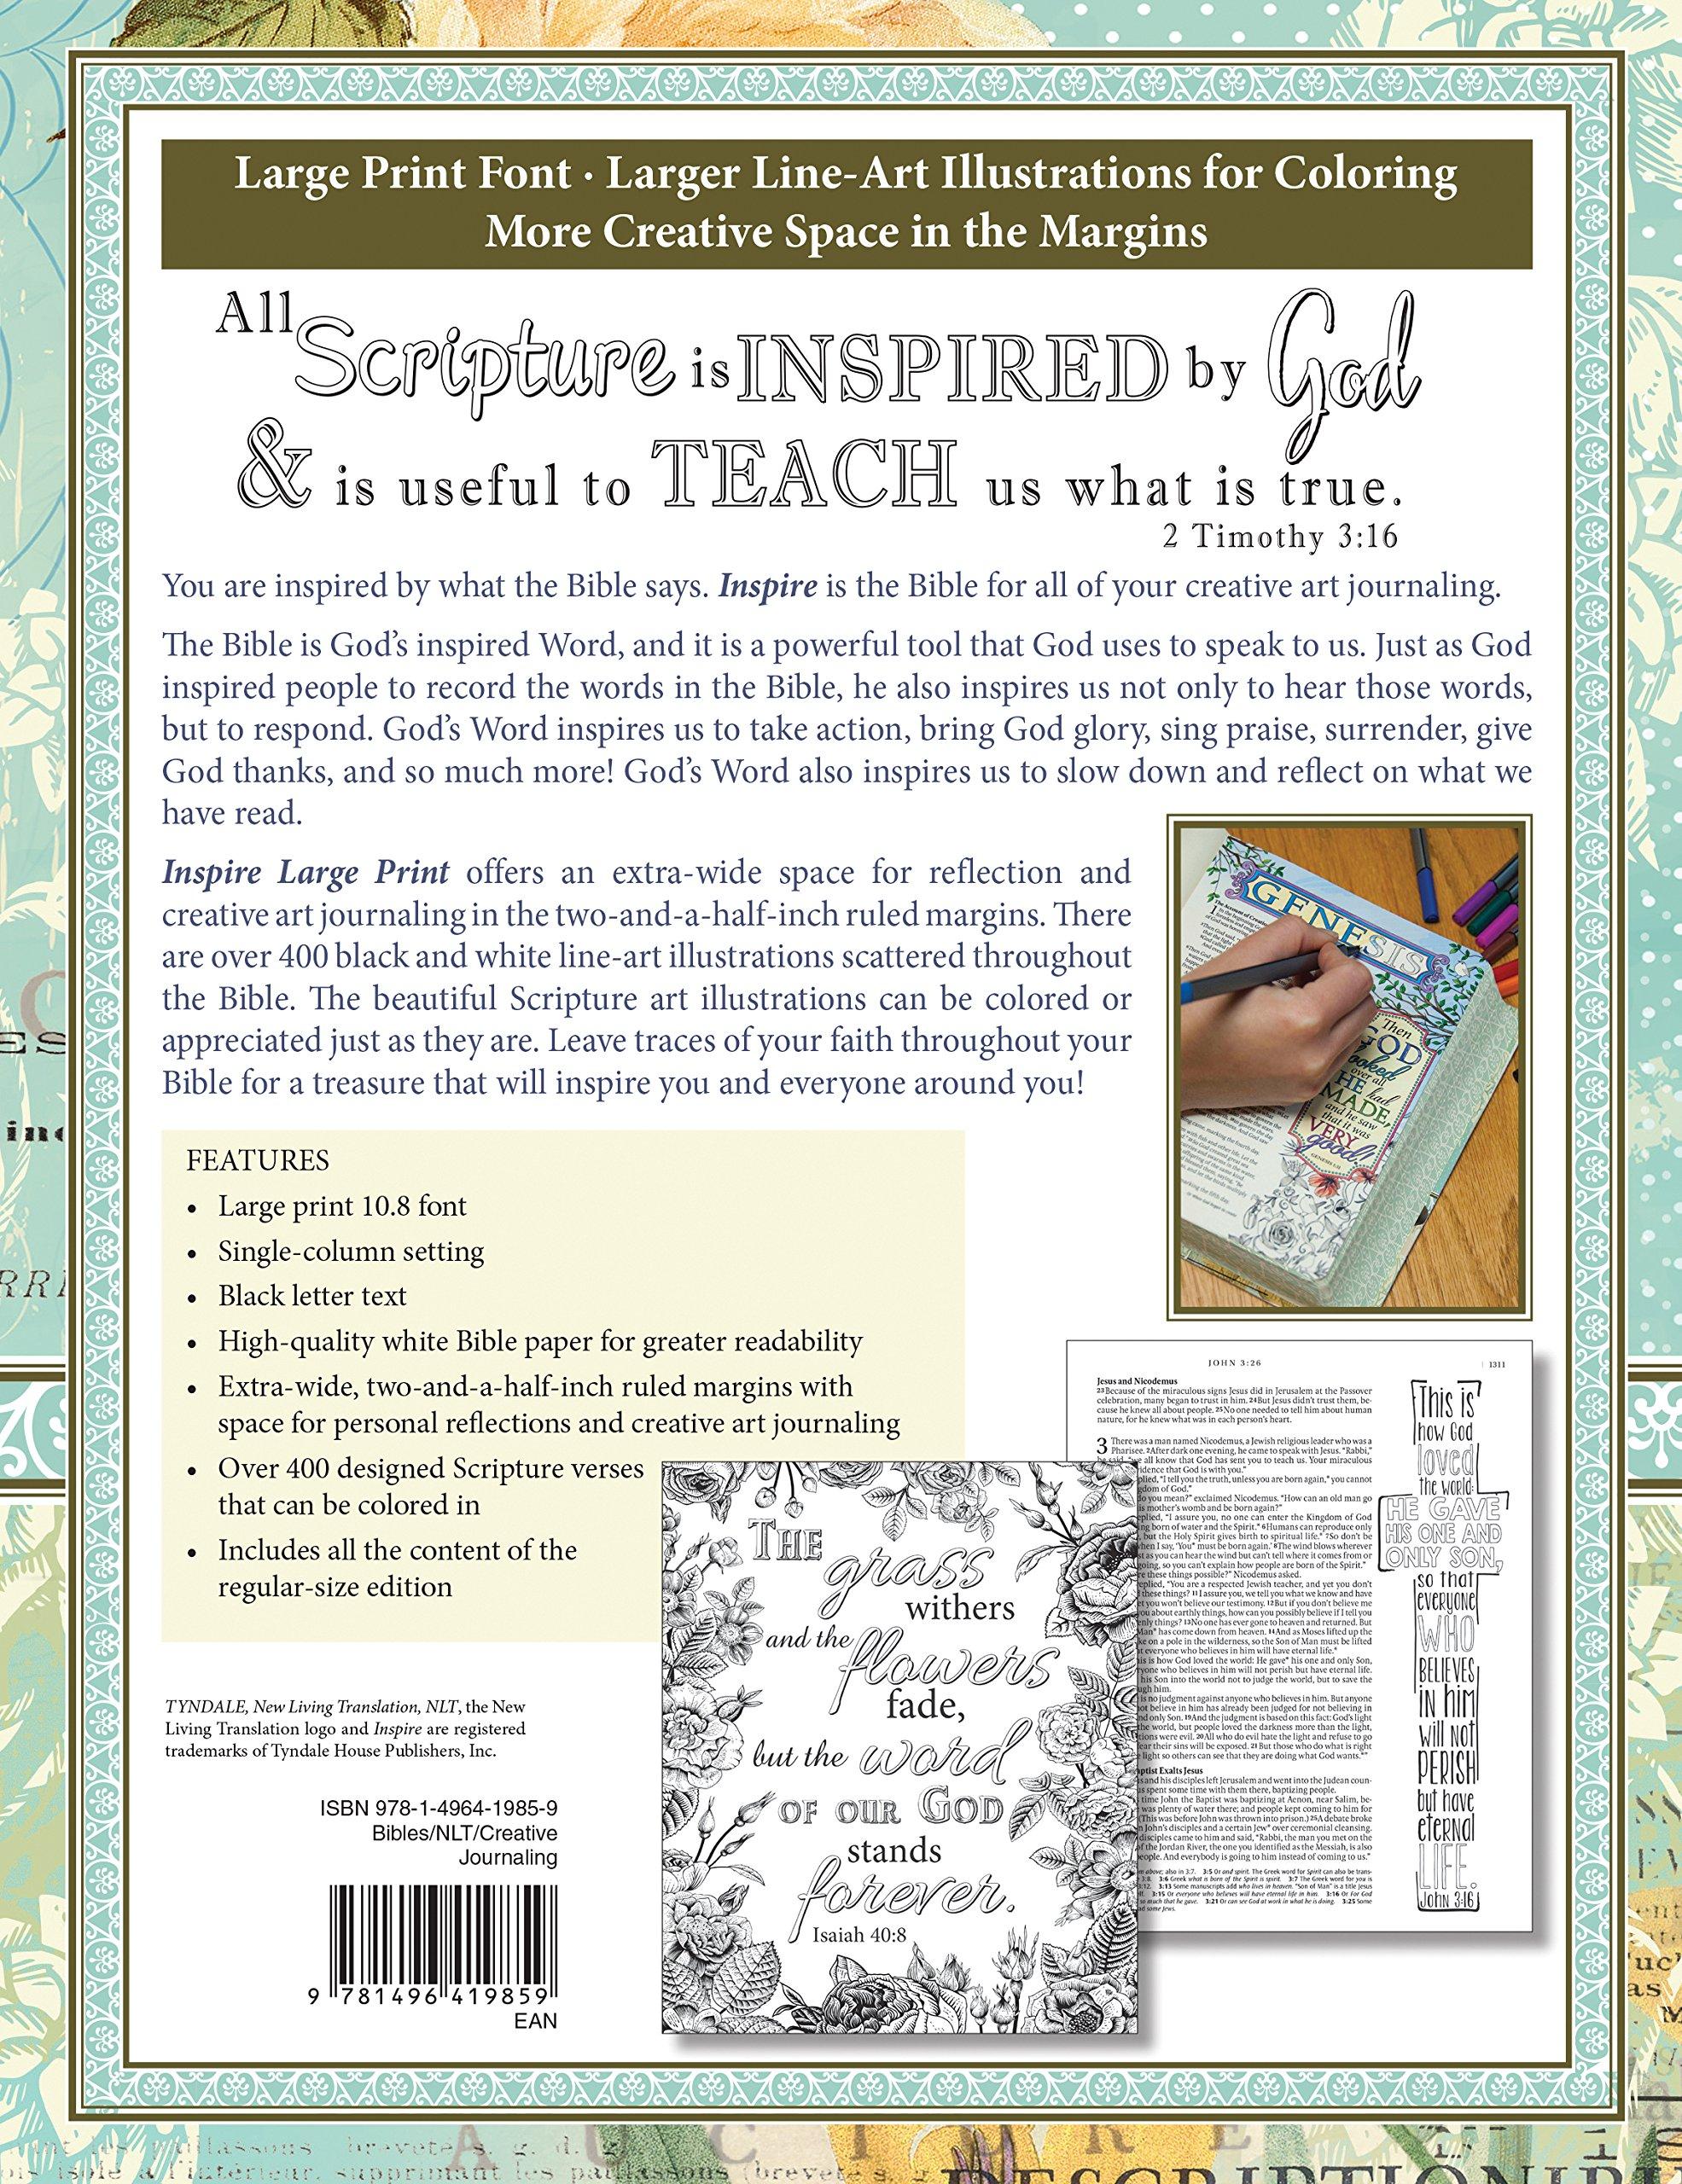 Inspire Bible NLT The For Creative Journaling Large Print Amazoncouk Tynda Christian Art 9781496419859 Books